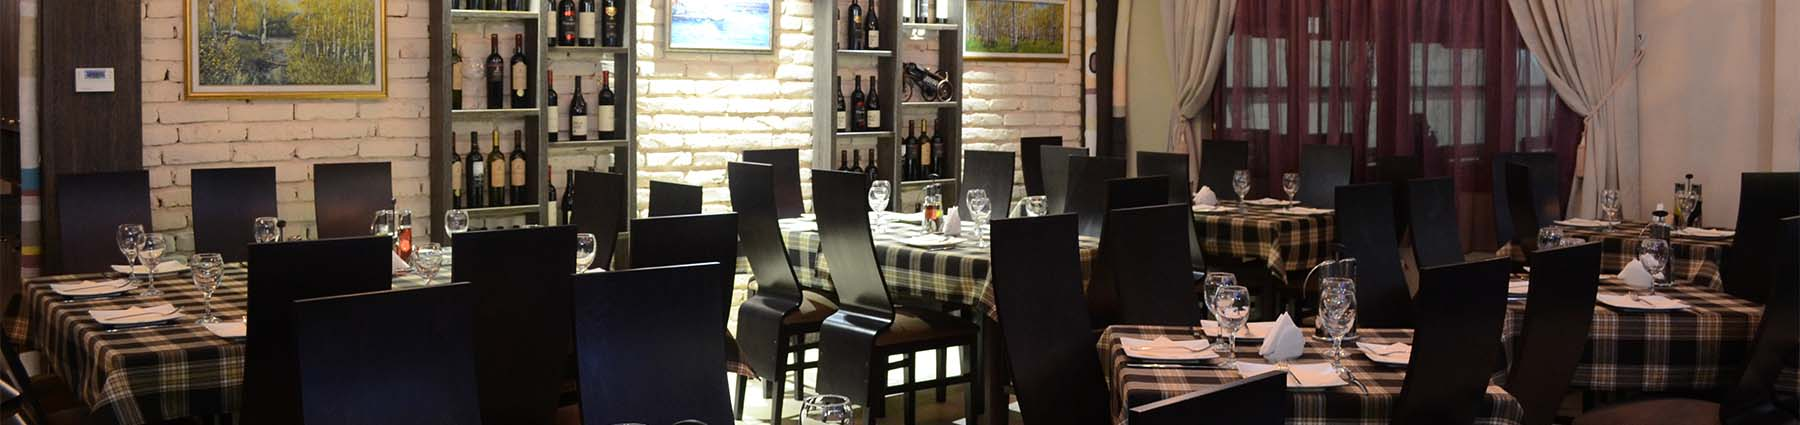 Ресторан Деи Фрателли